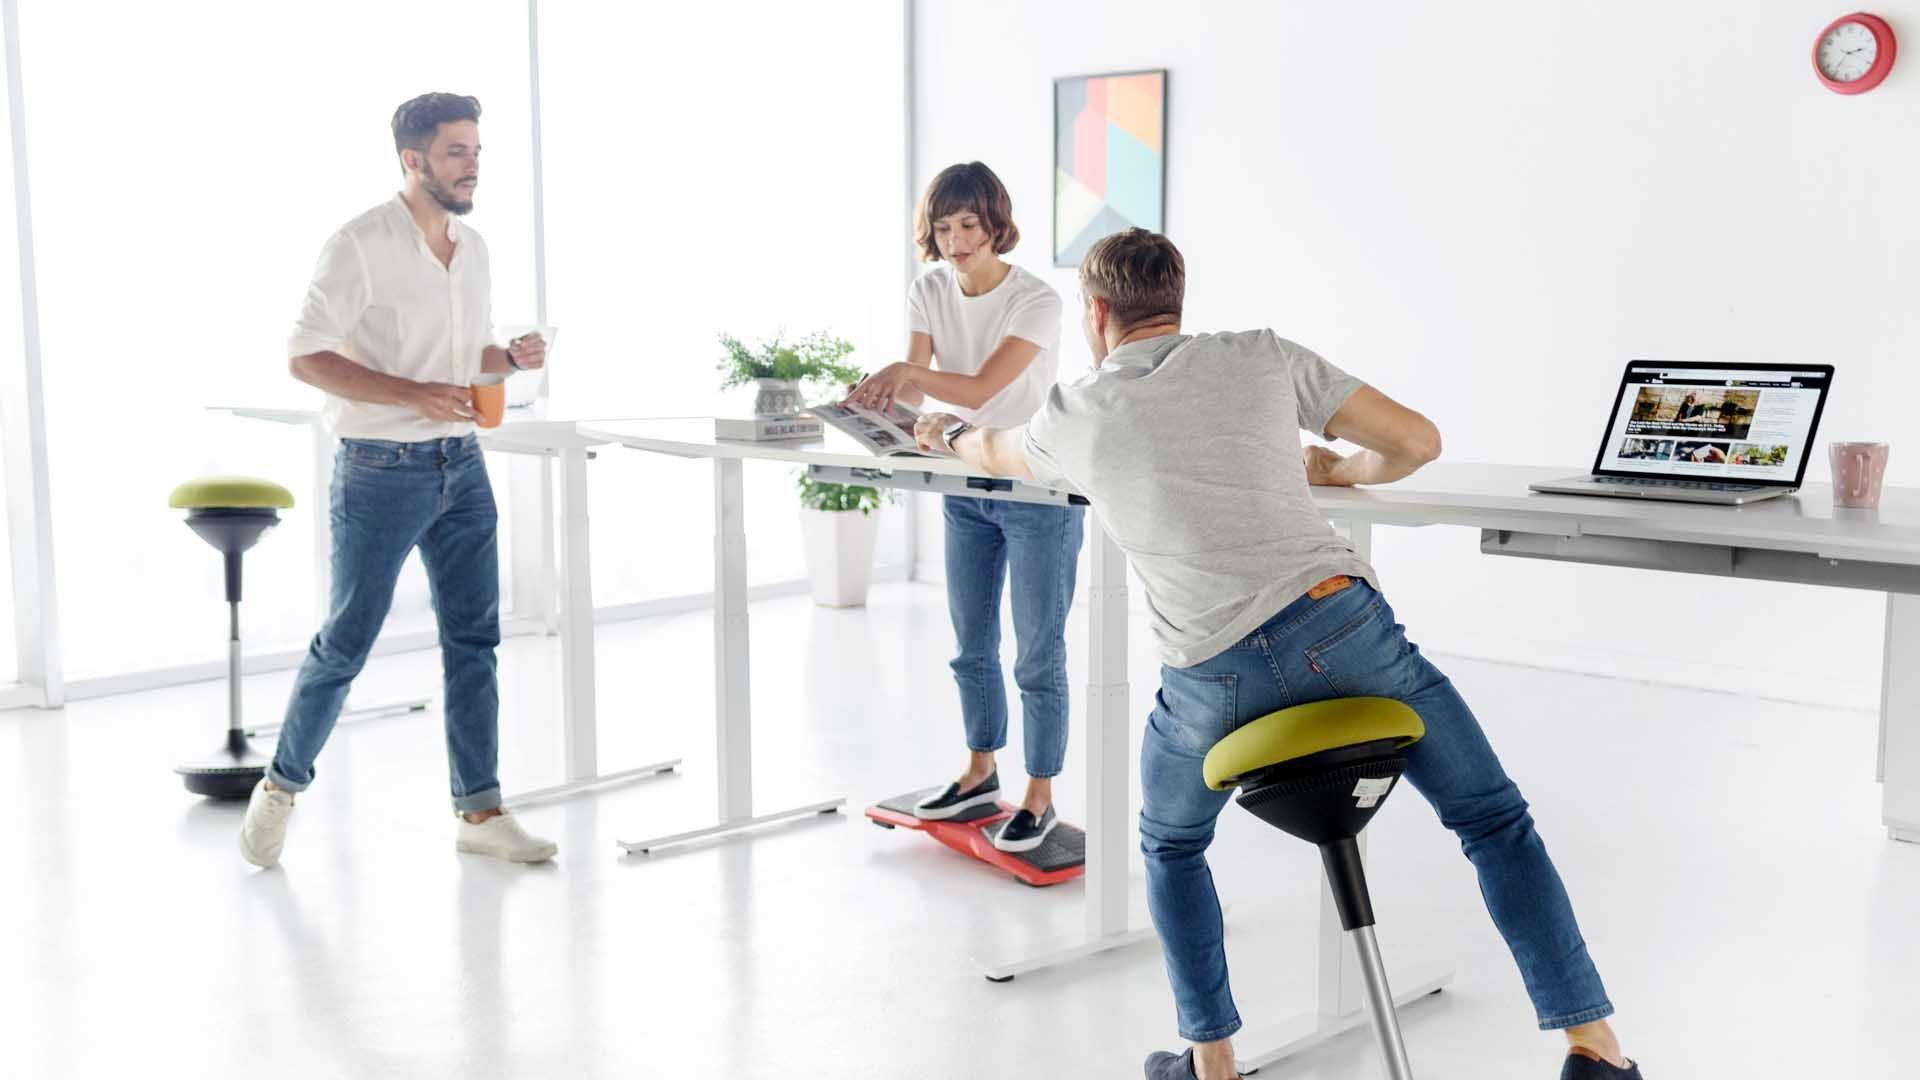 Creating a safe work environment